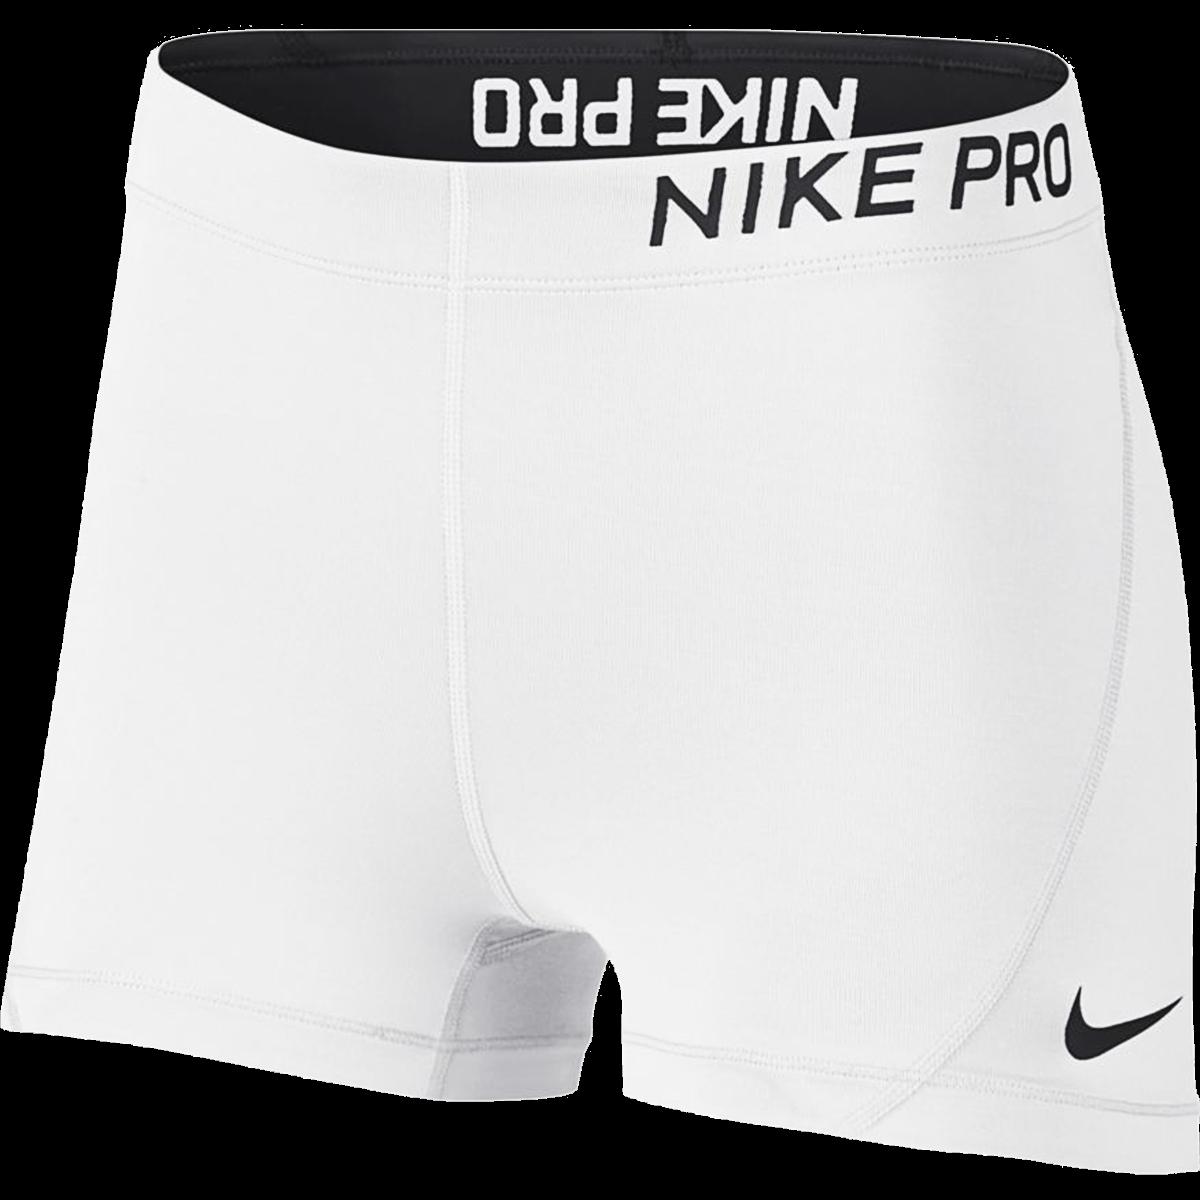 Nike Women S Pro 3 Short White M Nike Women Outfits Nike Spandex Shorts Nike Outfits